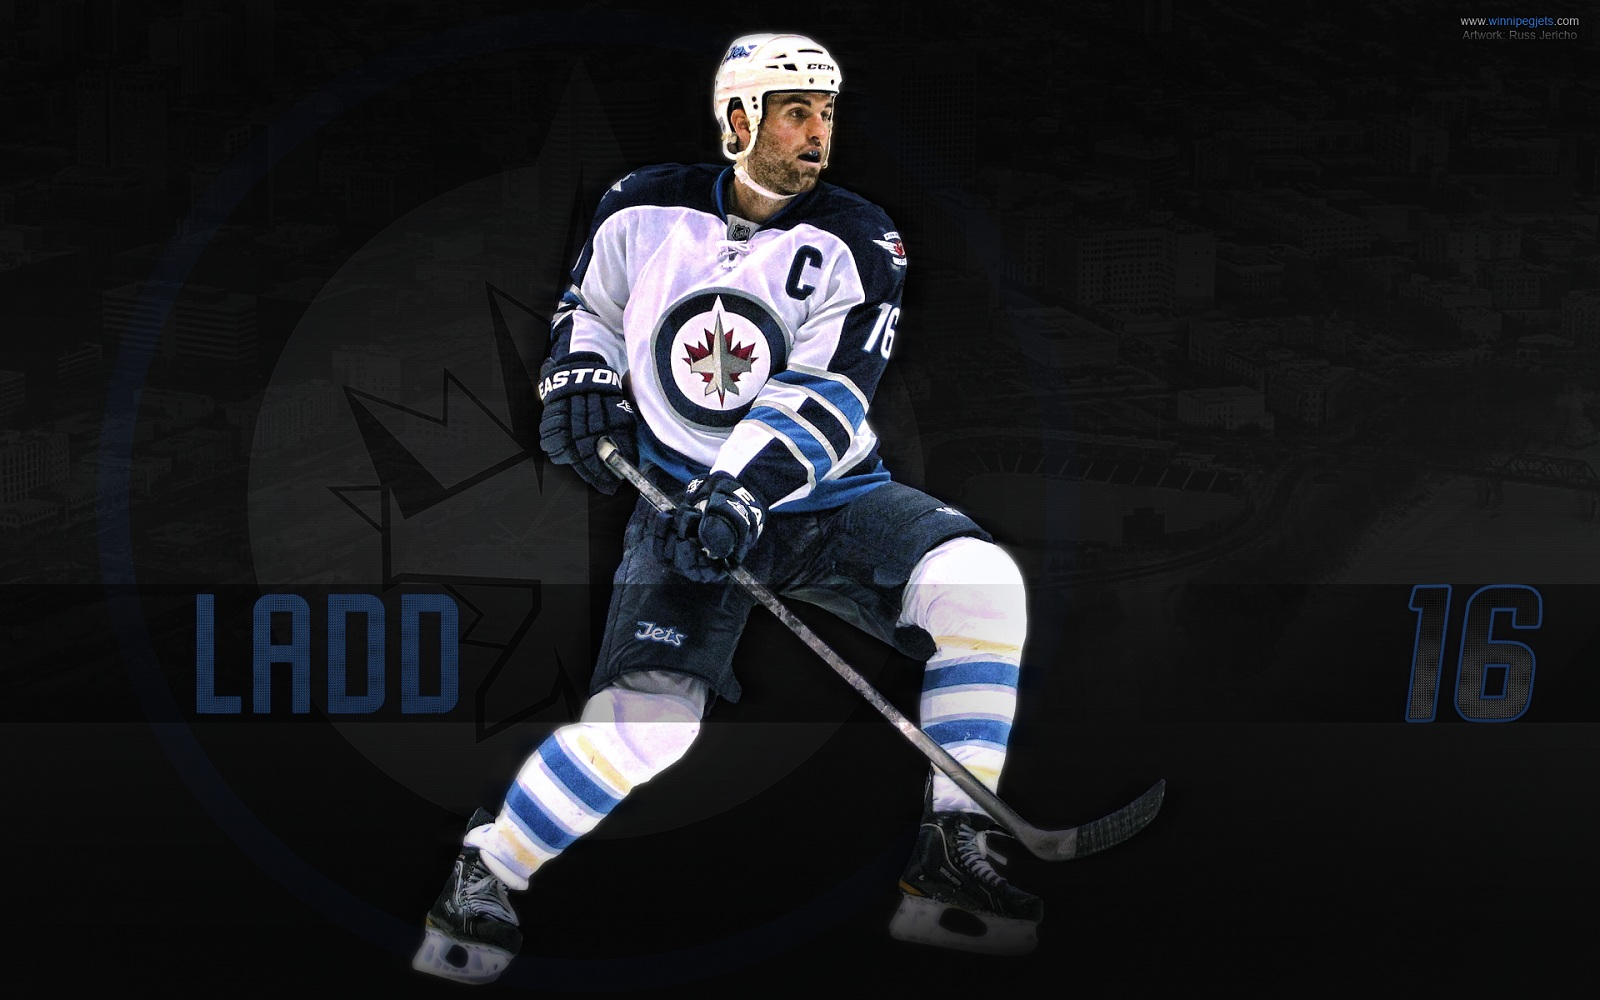 hockey Andrew Ladd Winnipeg Jets wallpaper background 1600x1000